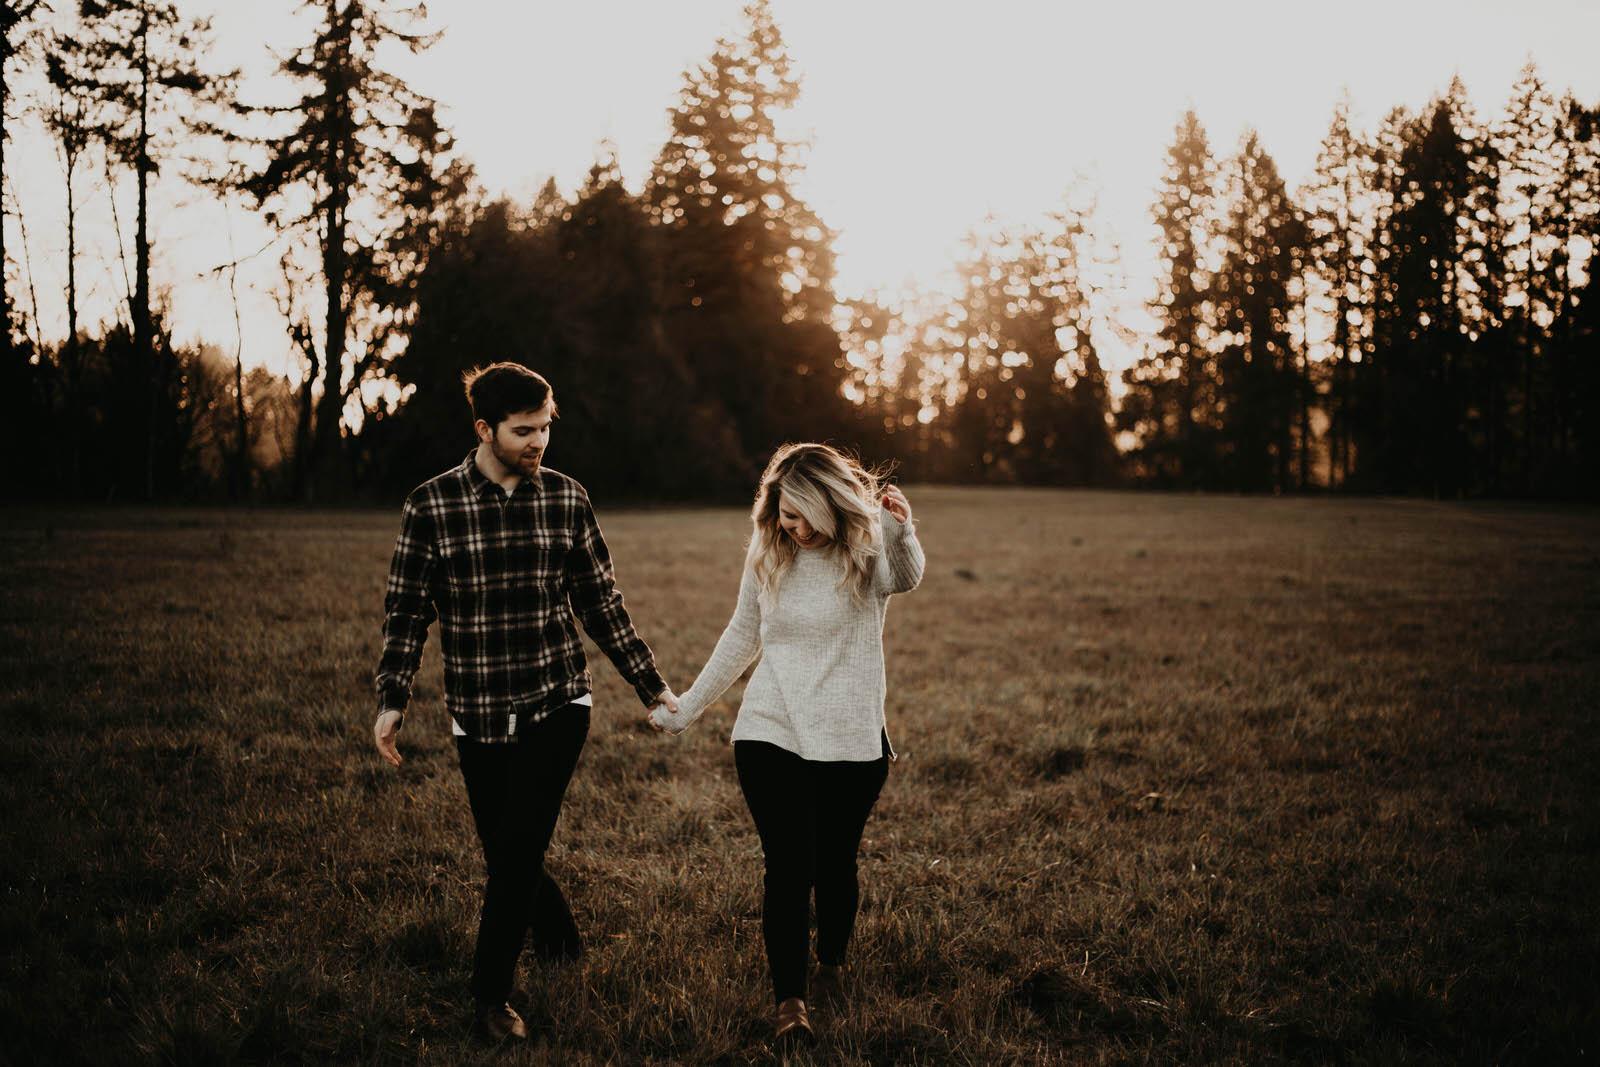 kayla-tallon-jamiecarle-couples-session-portland-9944.jpg